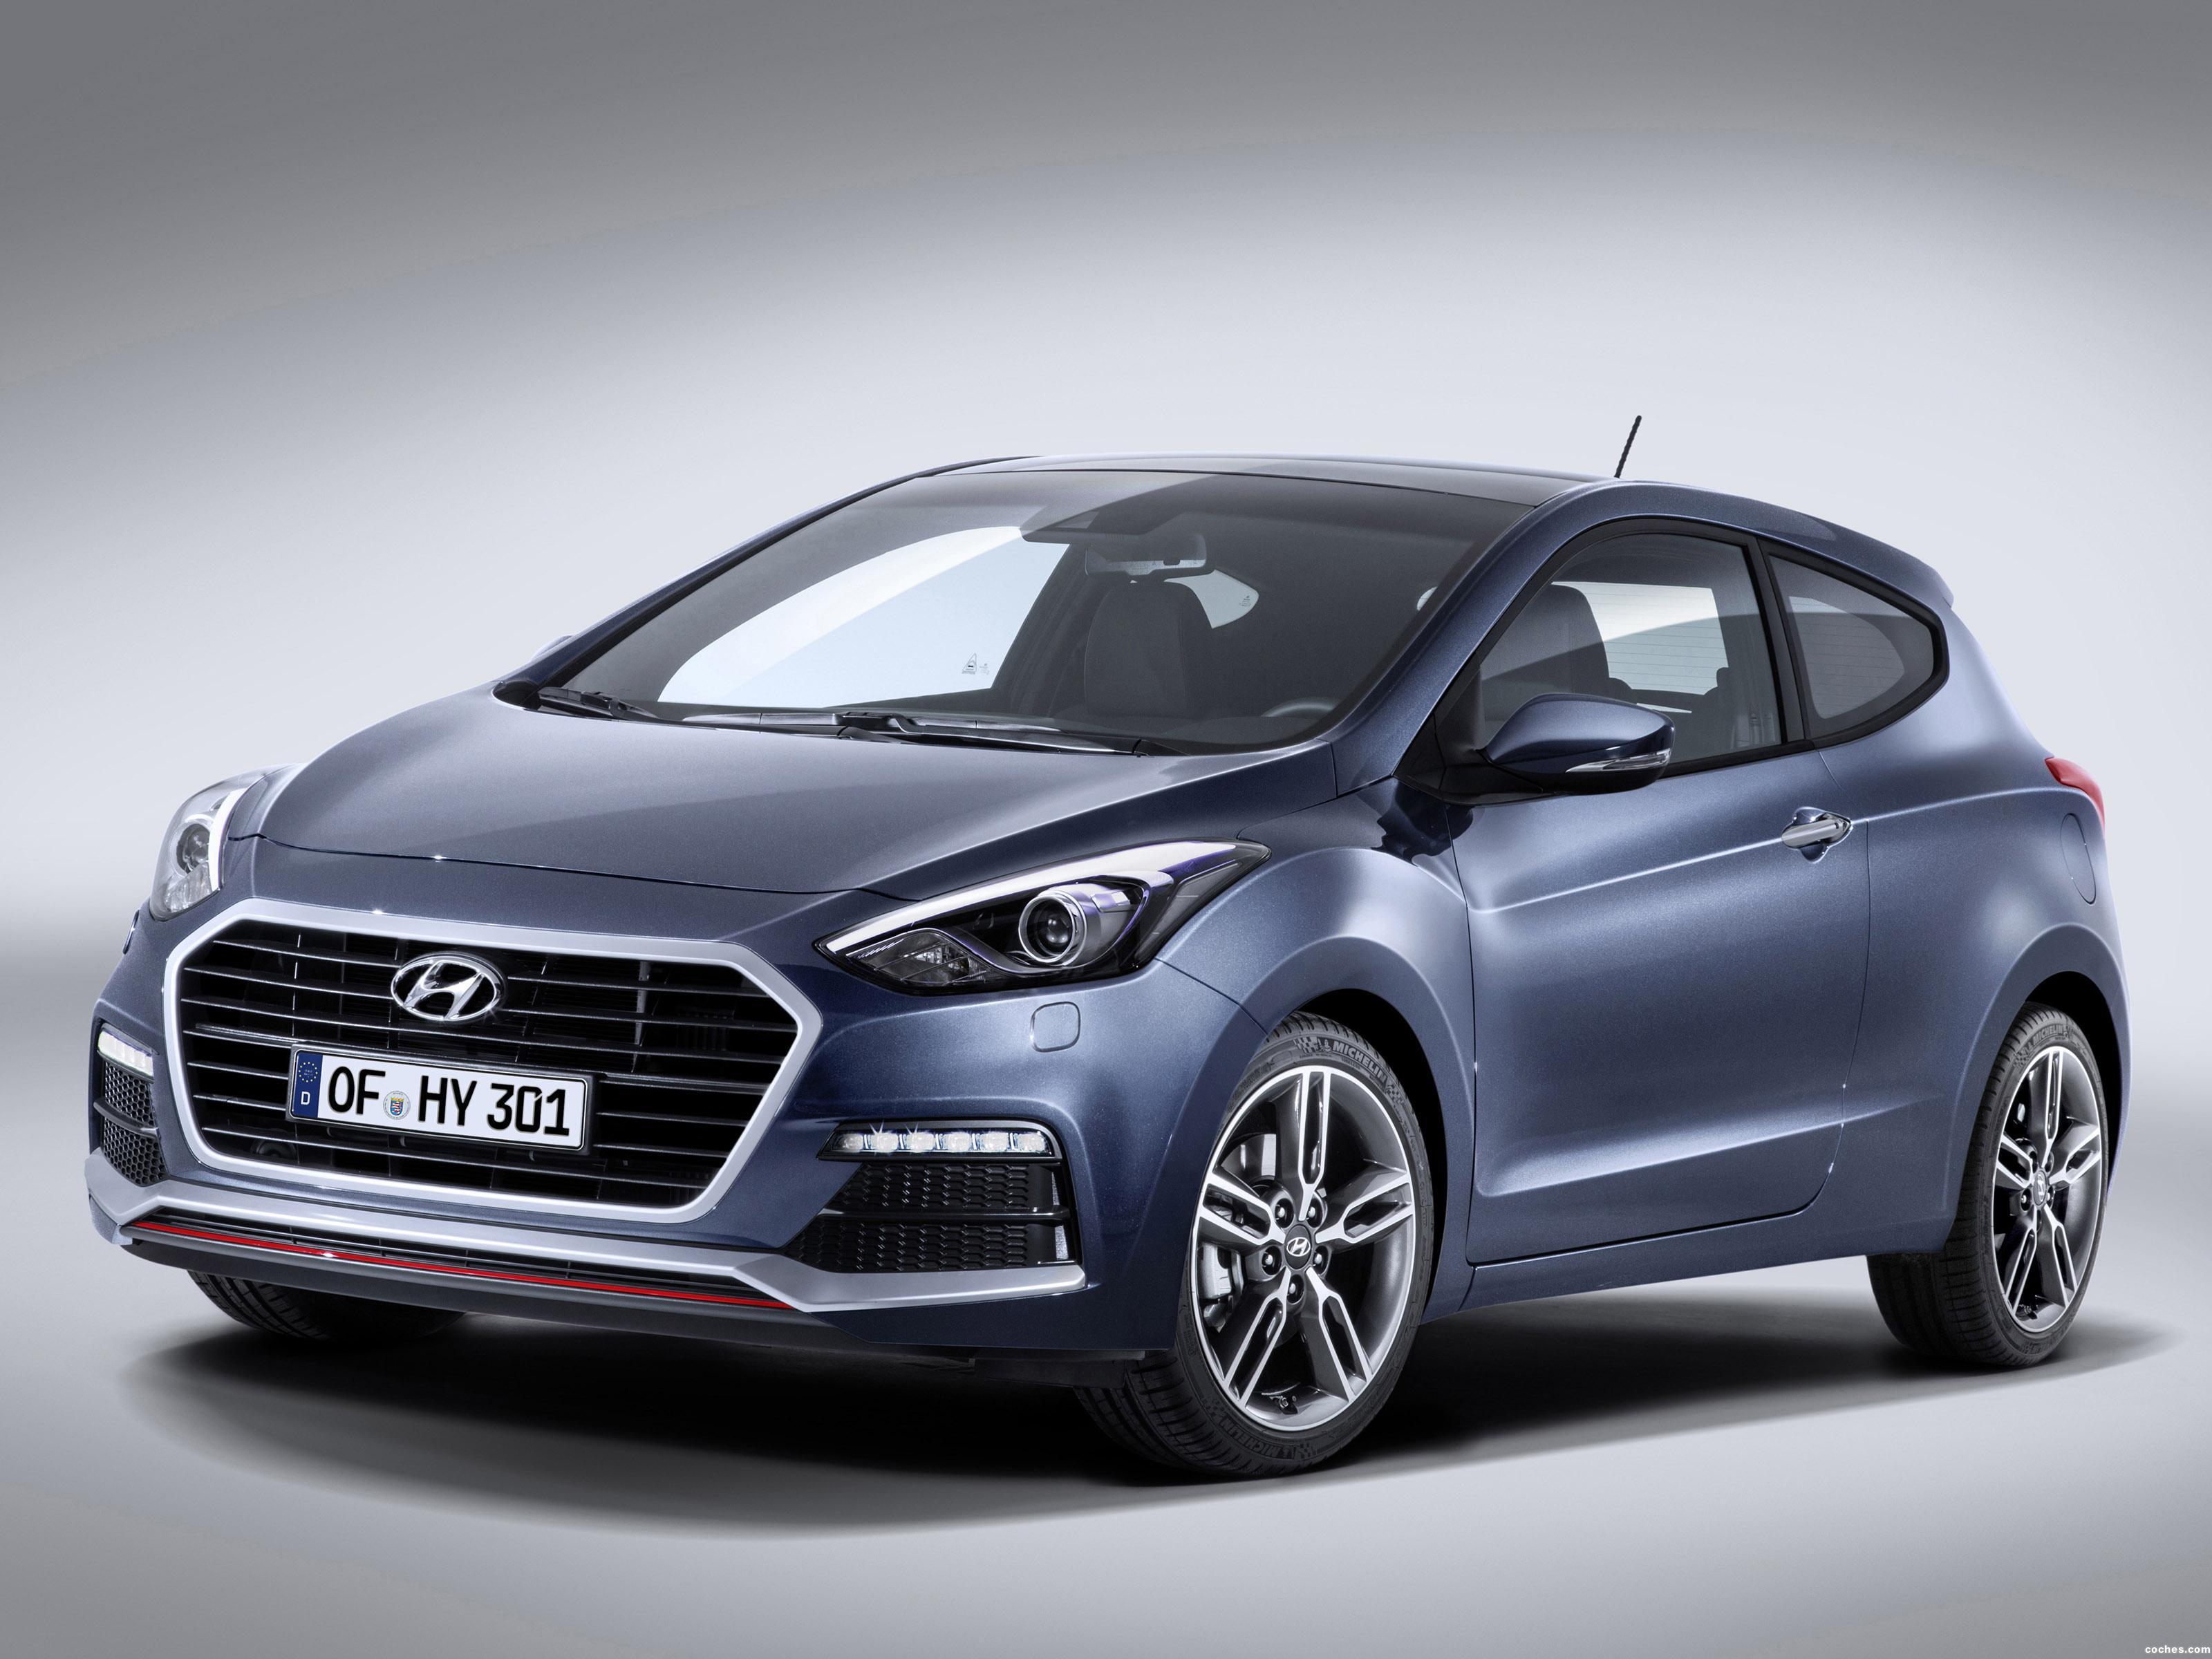 Foto 0 de Hyundai i30 3 puertas Turbo 2015